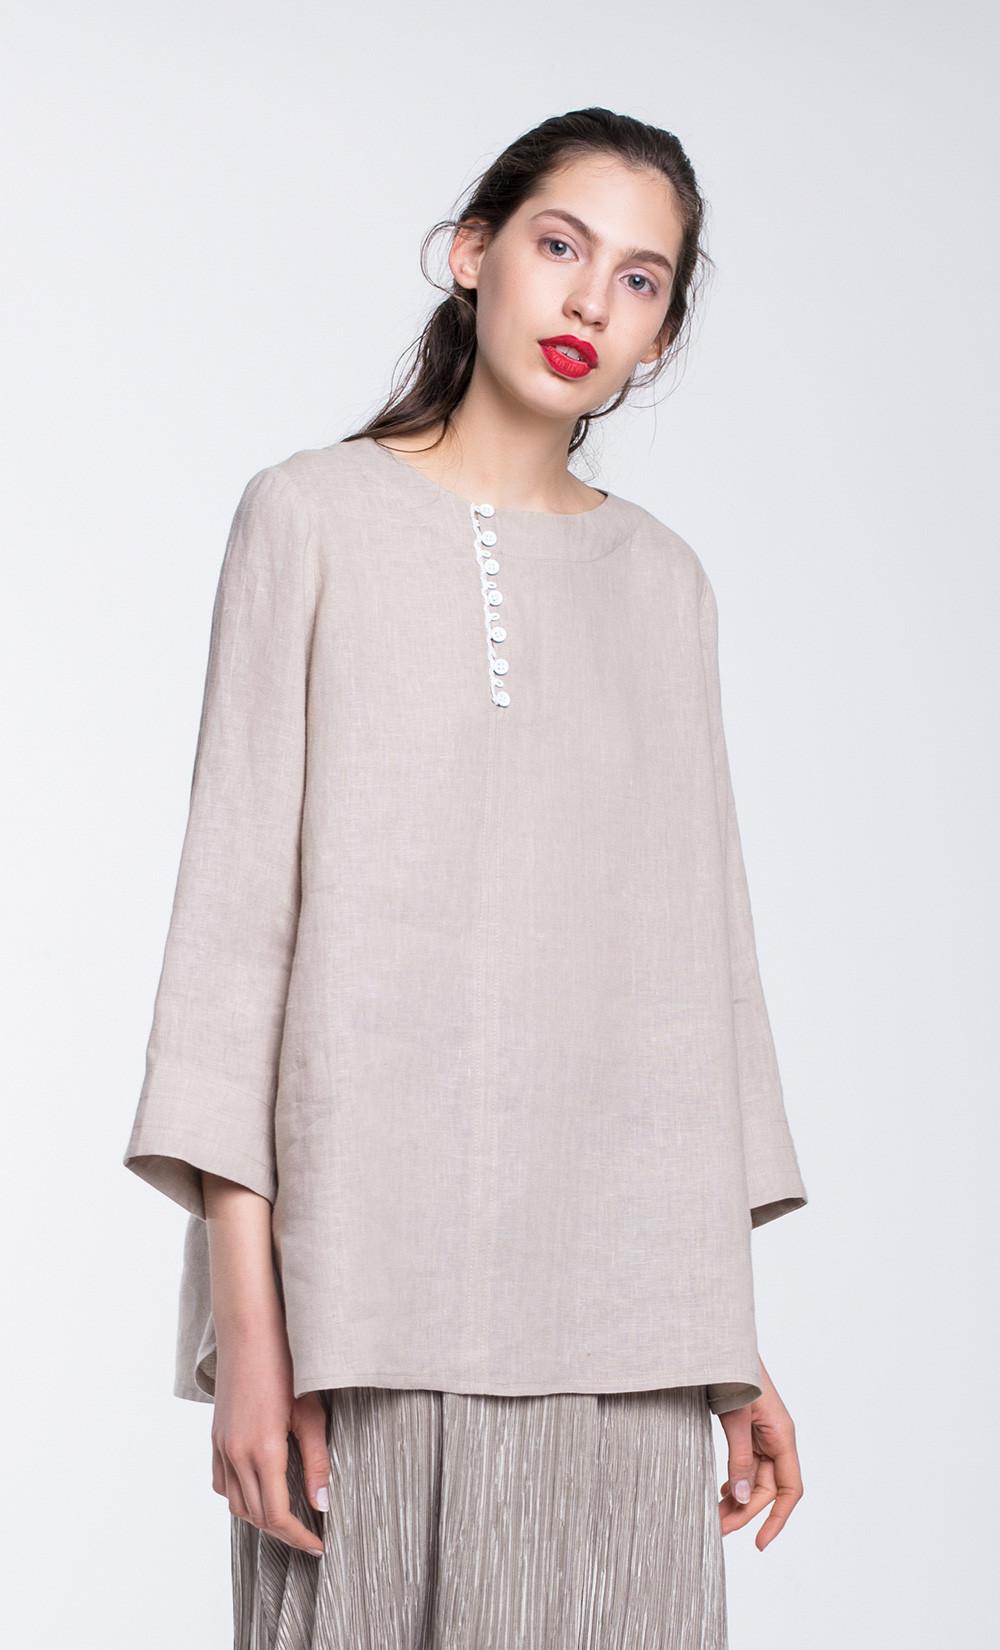 Robshka Shirt